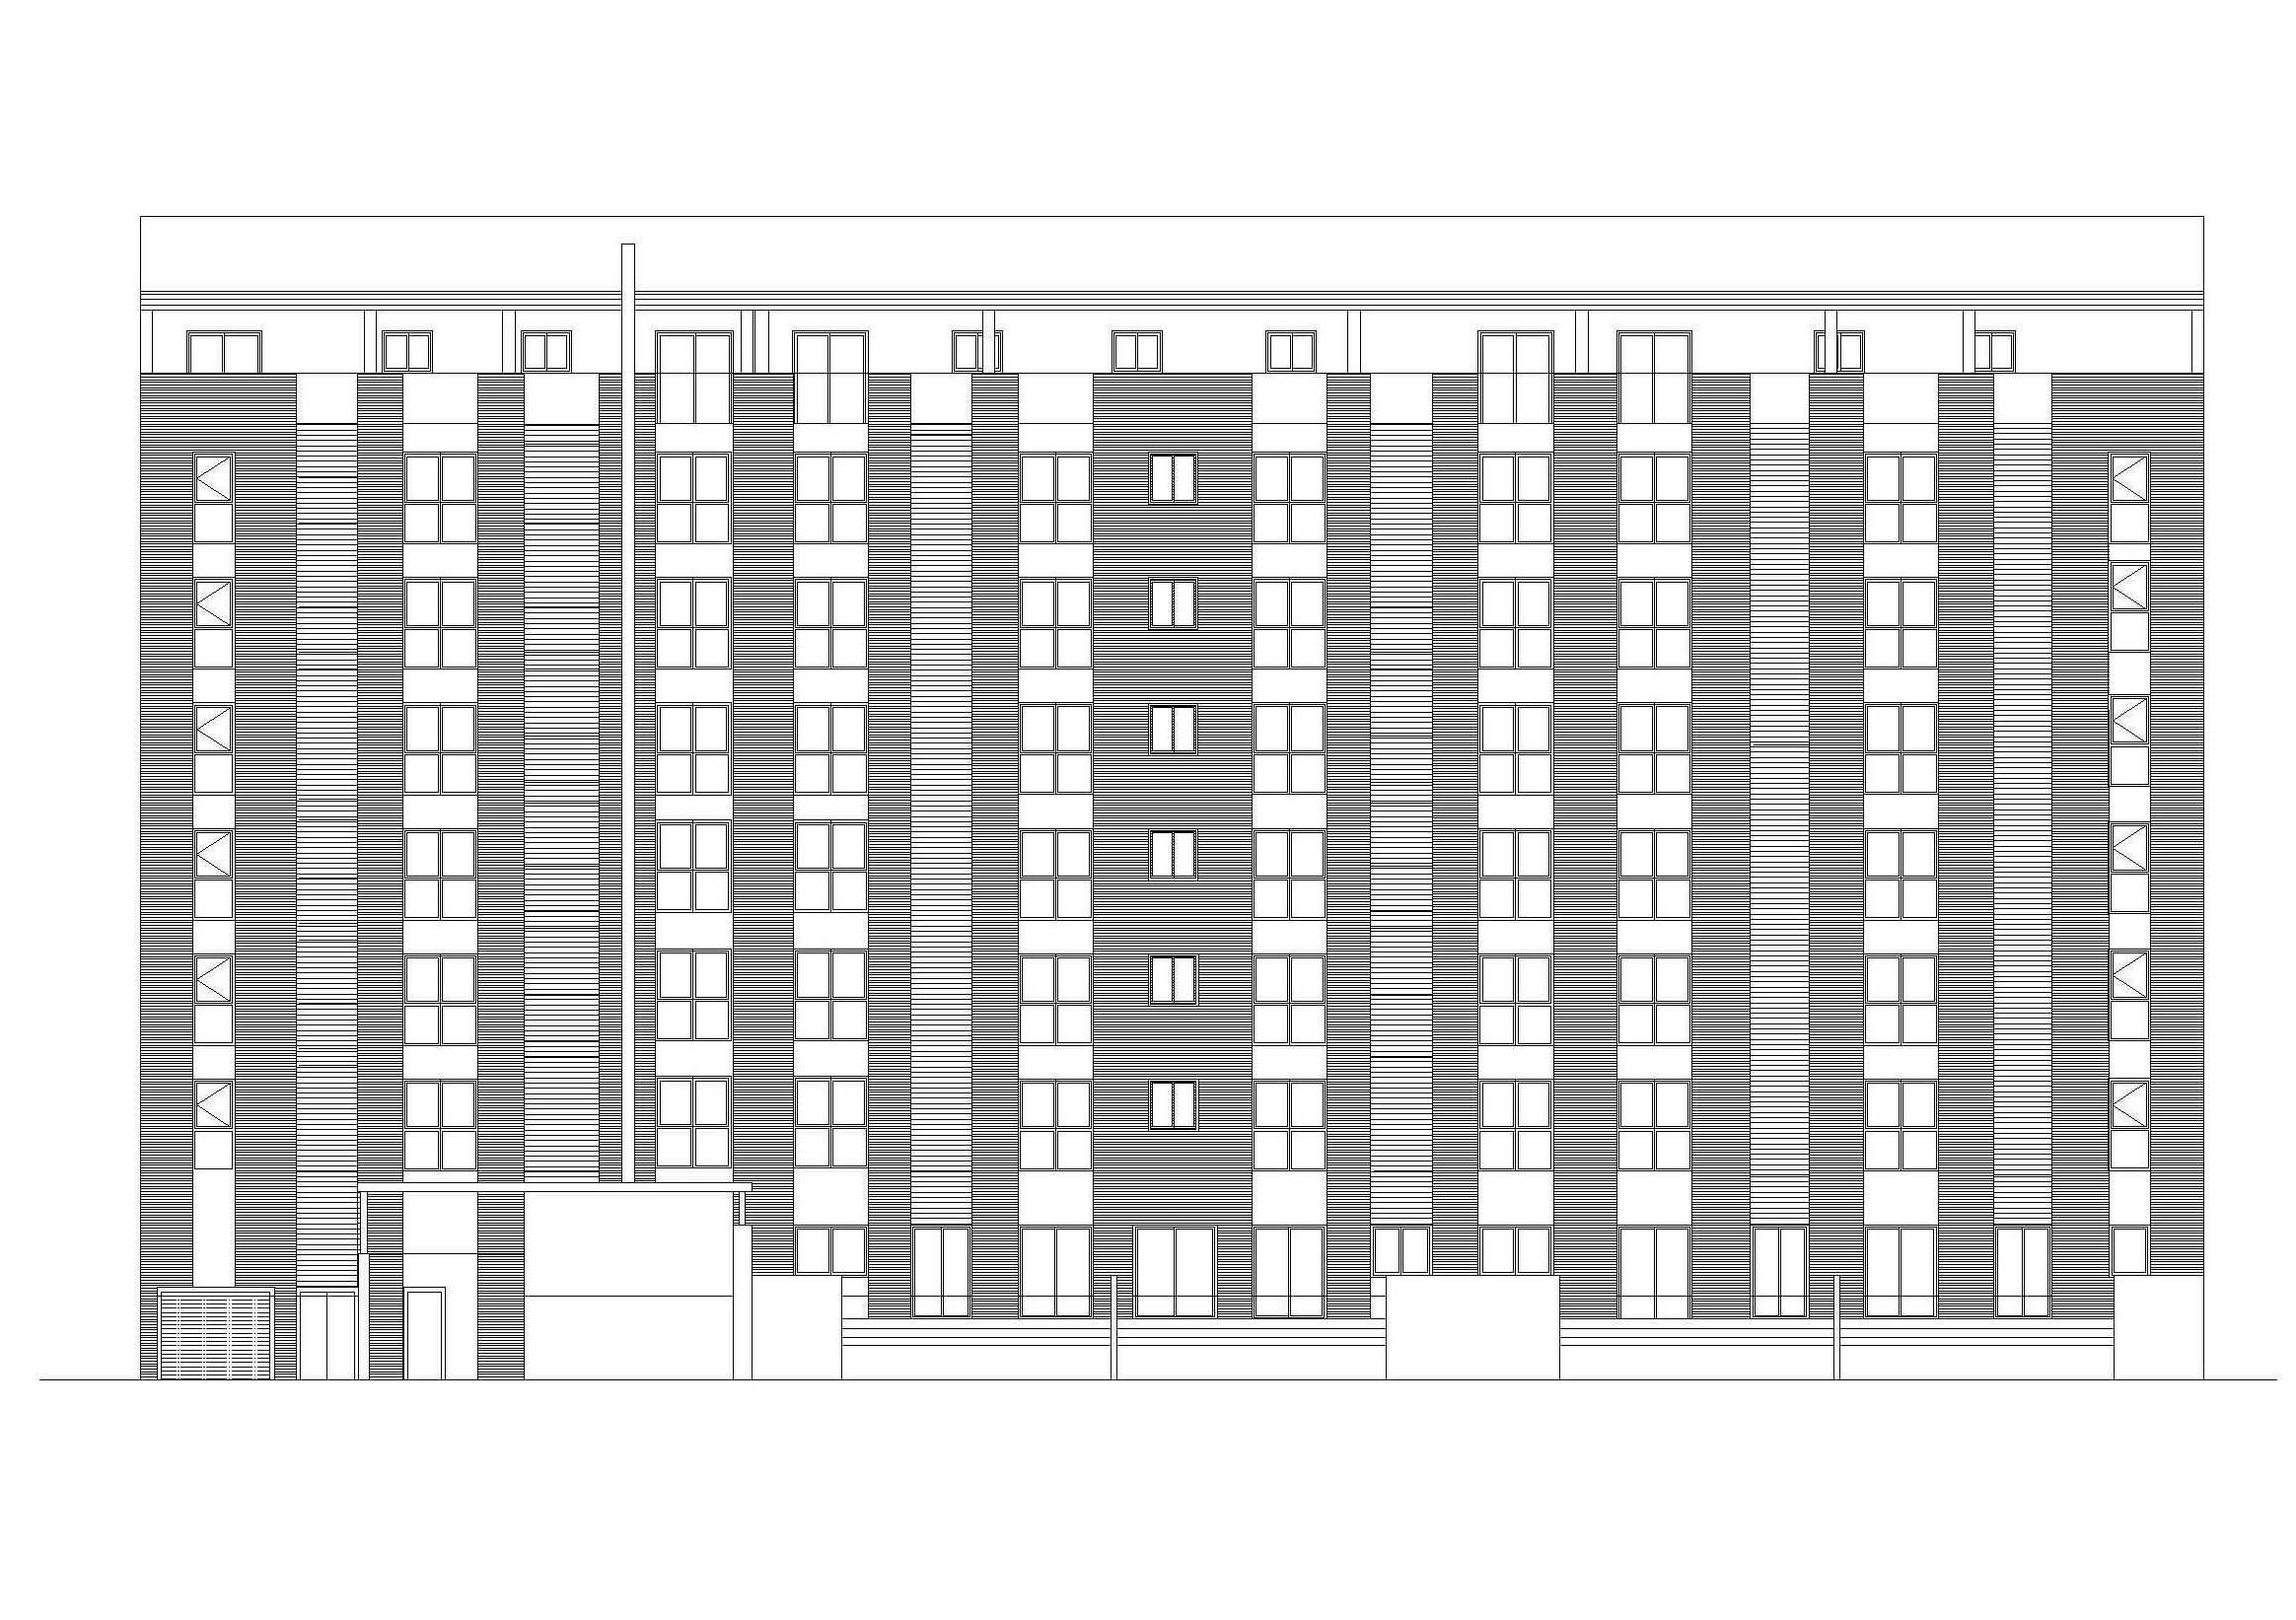 PROYECTO DE Edificio de viviendas en Benicalap, Valencia